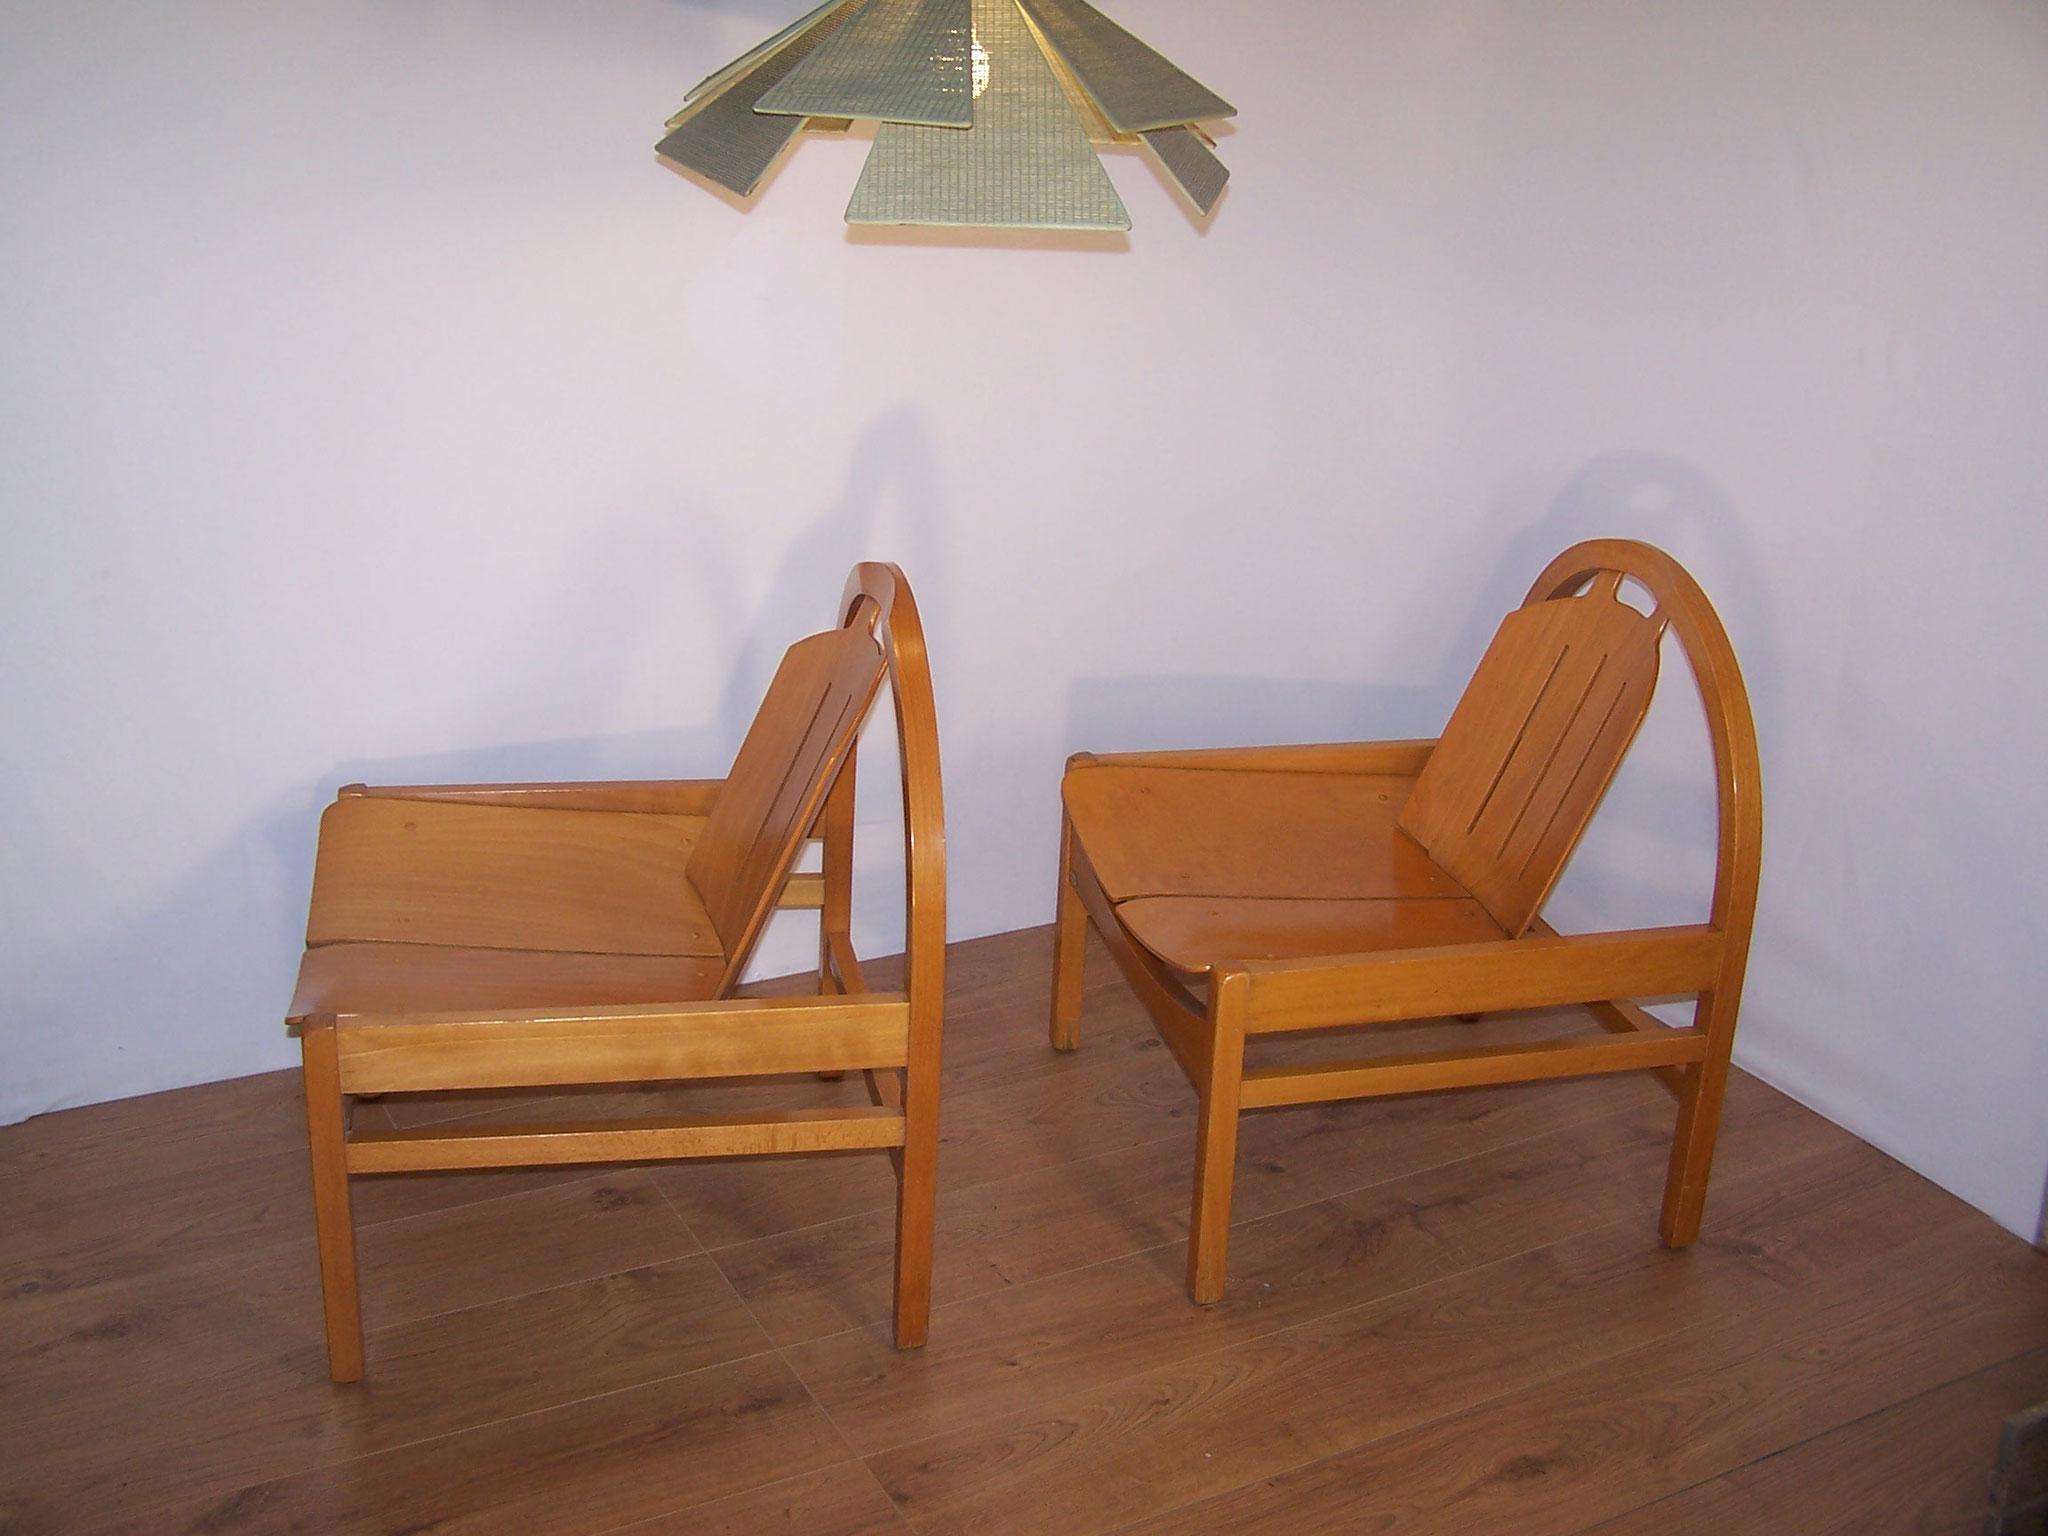 2 fauteuils lounge baumann majdeltier boutique en ligne. Black Bedroom Furniture Sets. Home Design Ideas